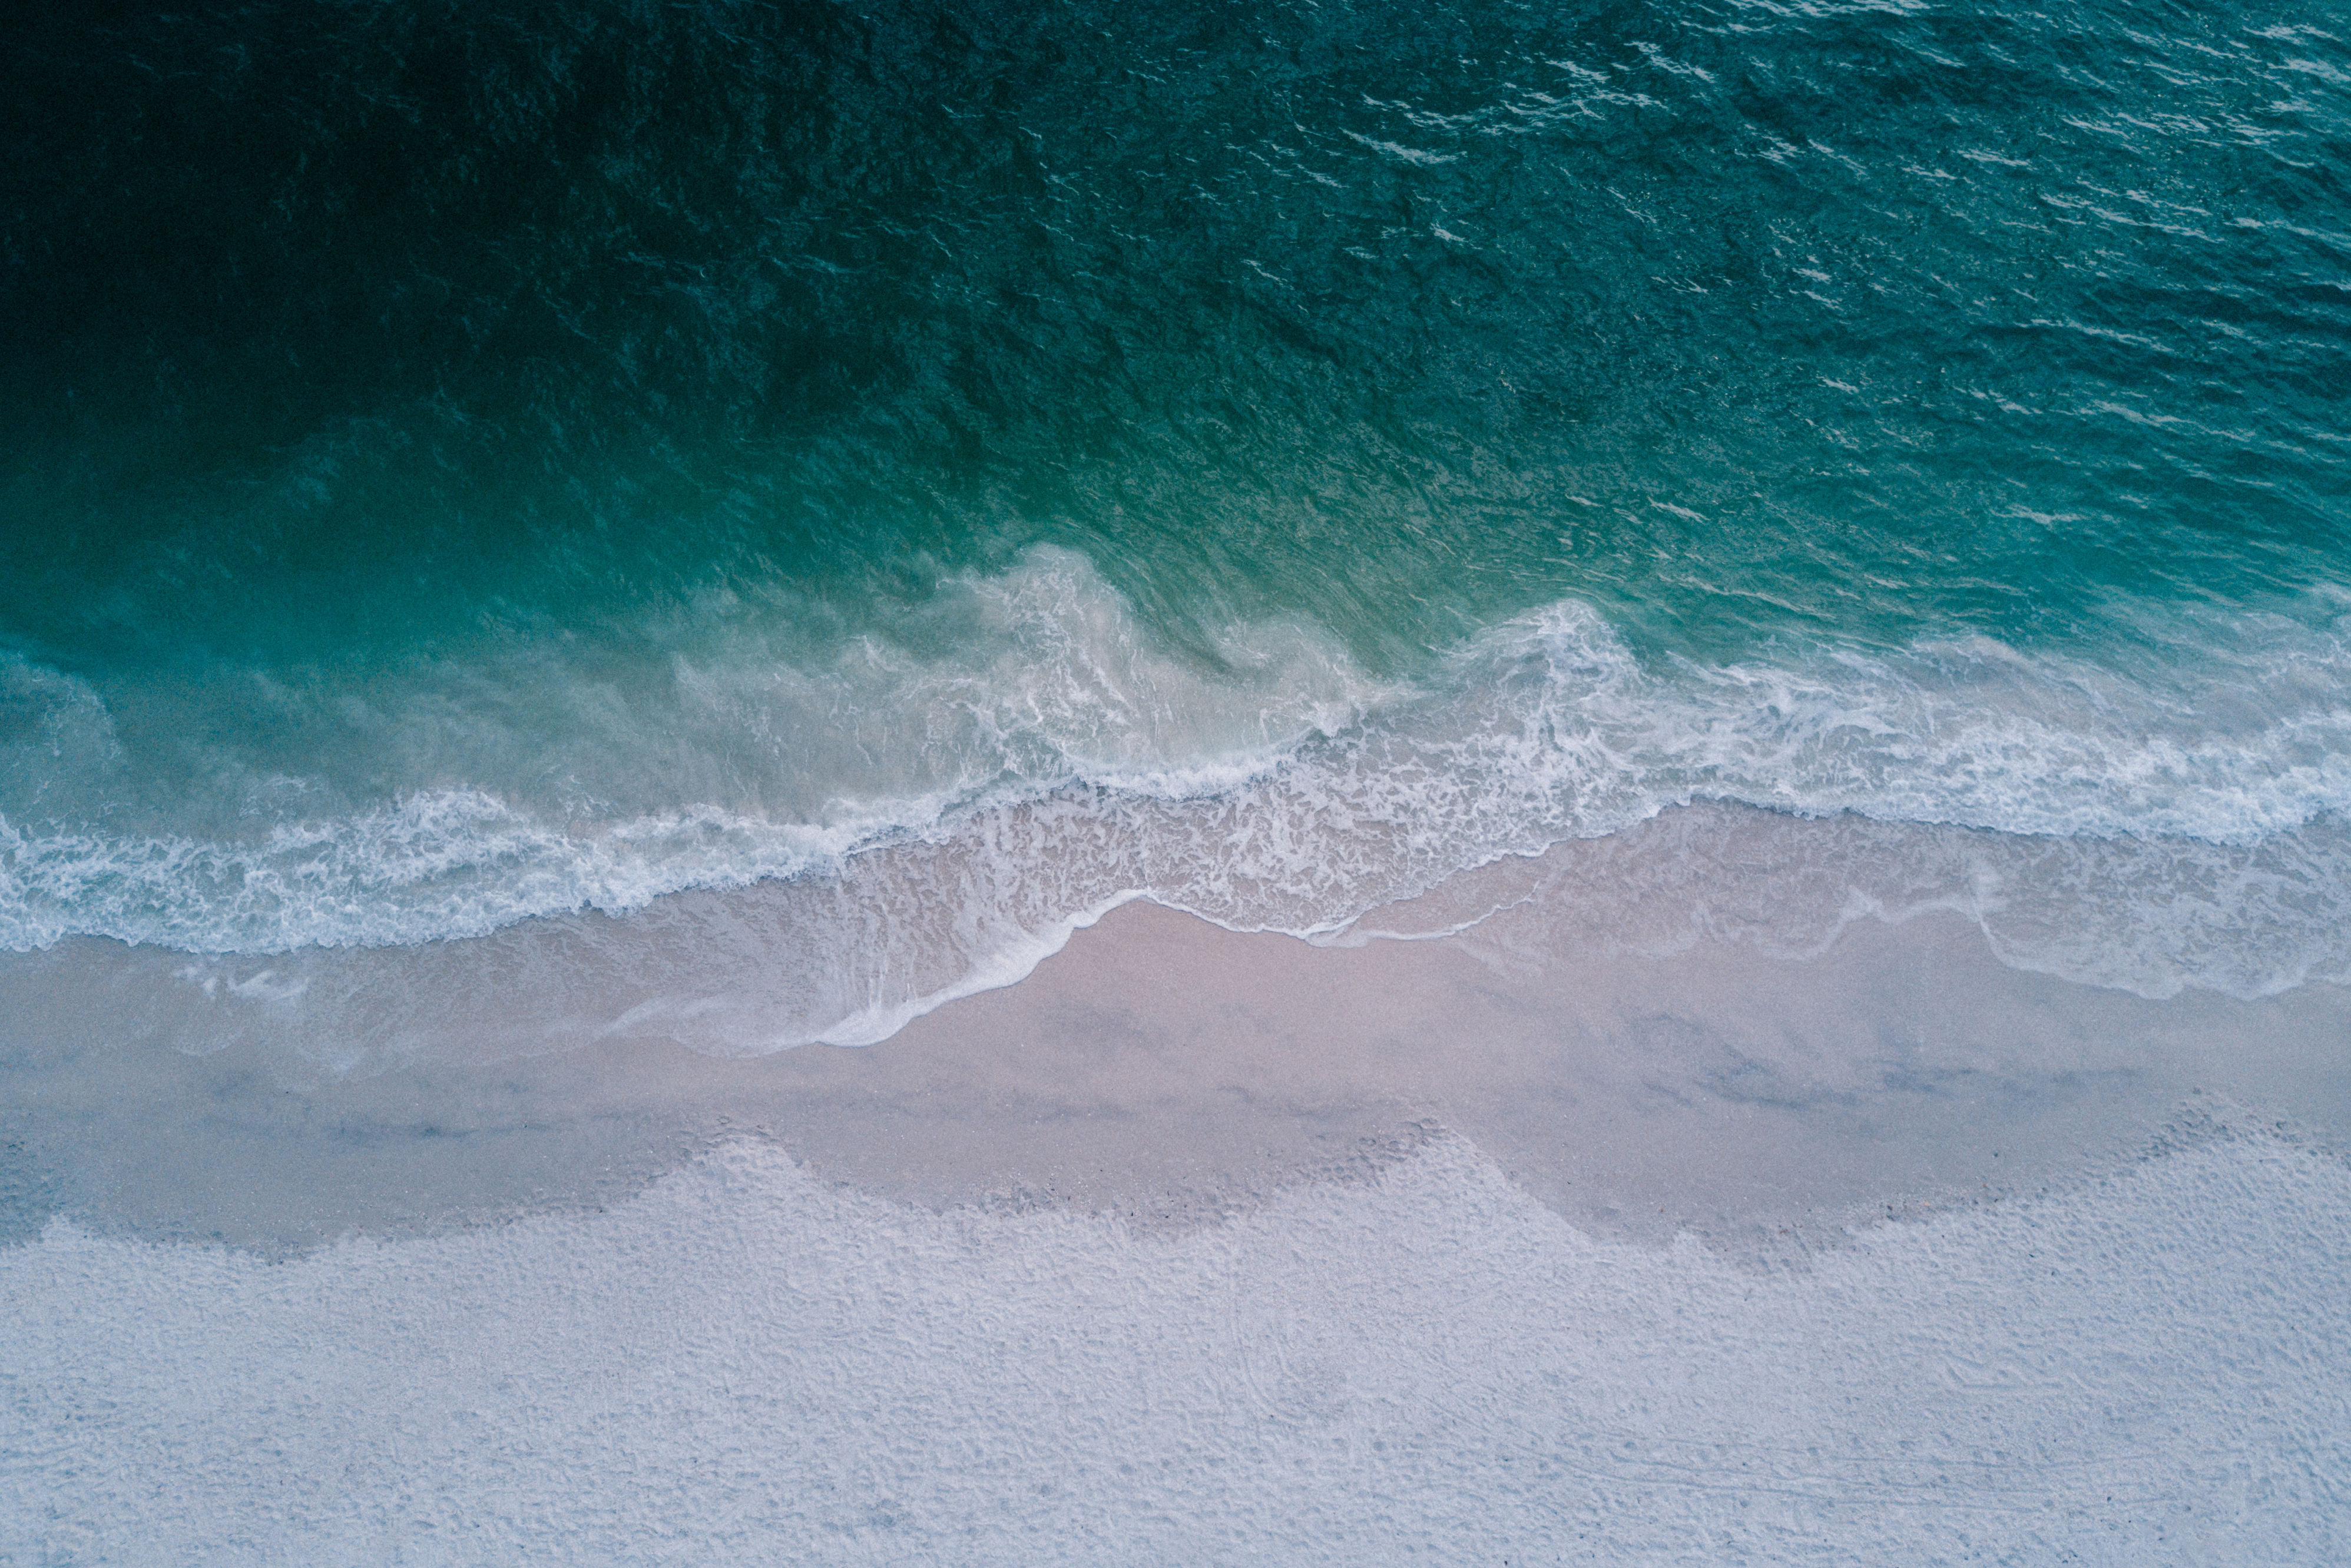 Sea ulgkad